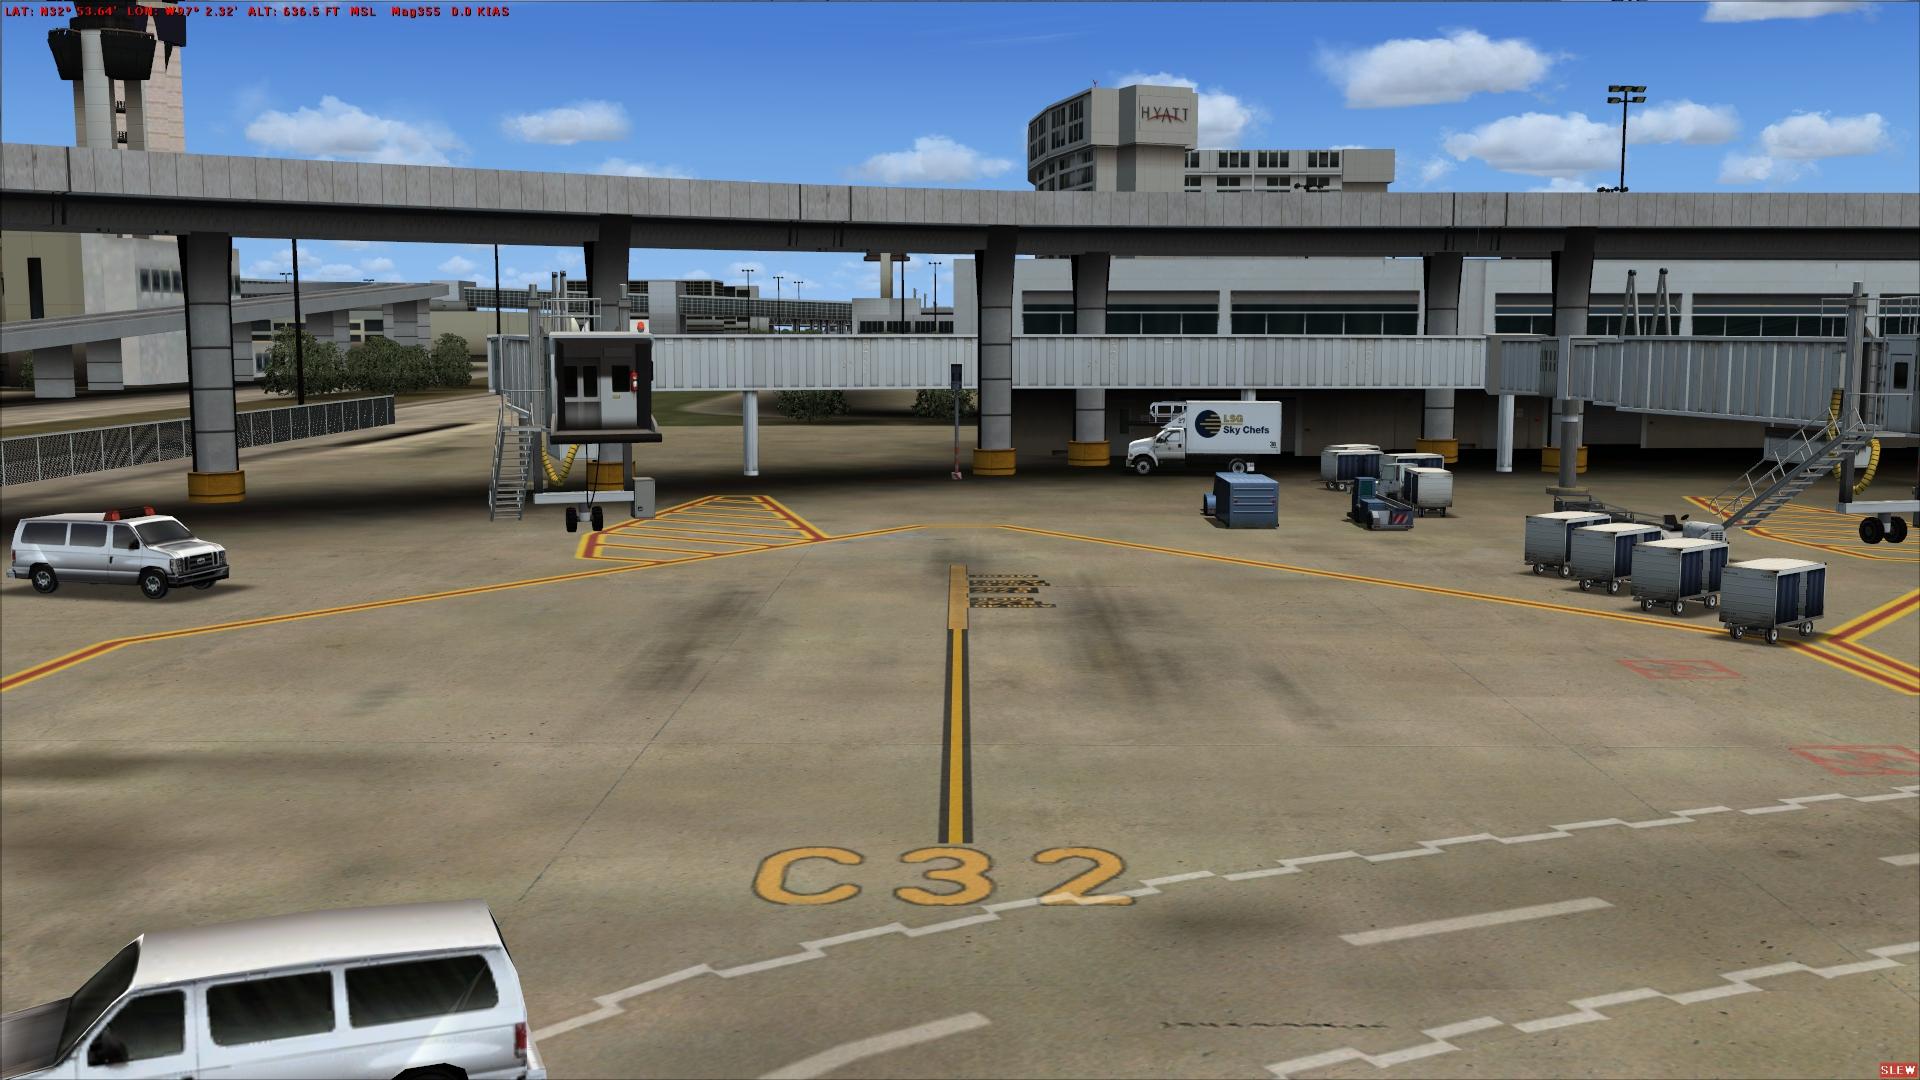 KDFW Gate 32.jpg